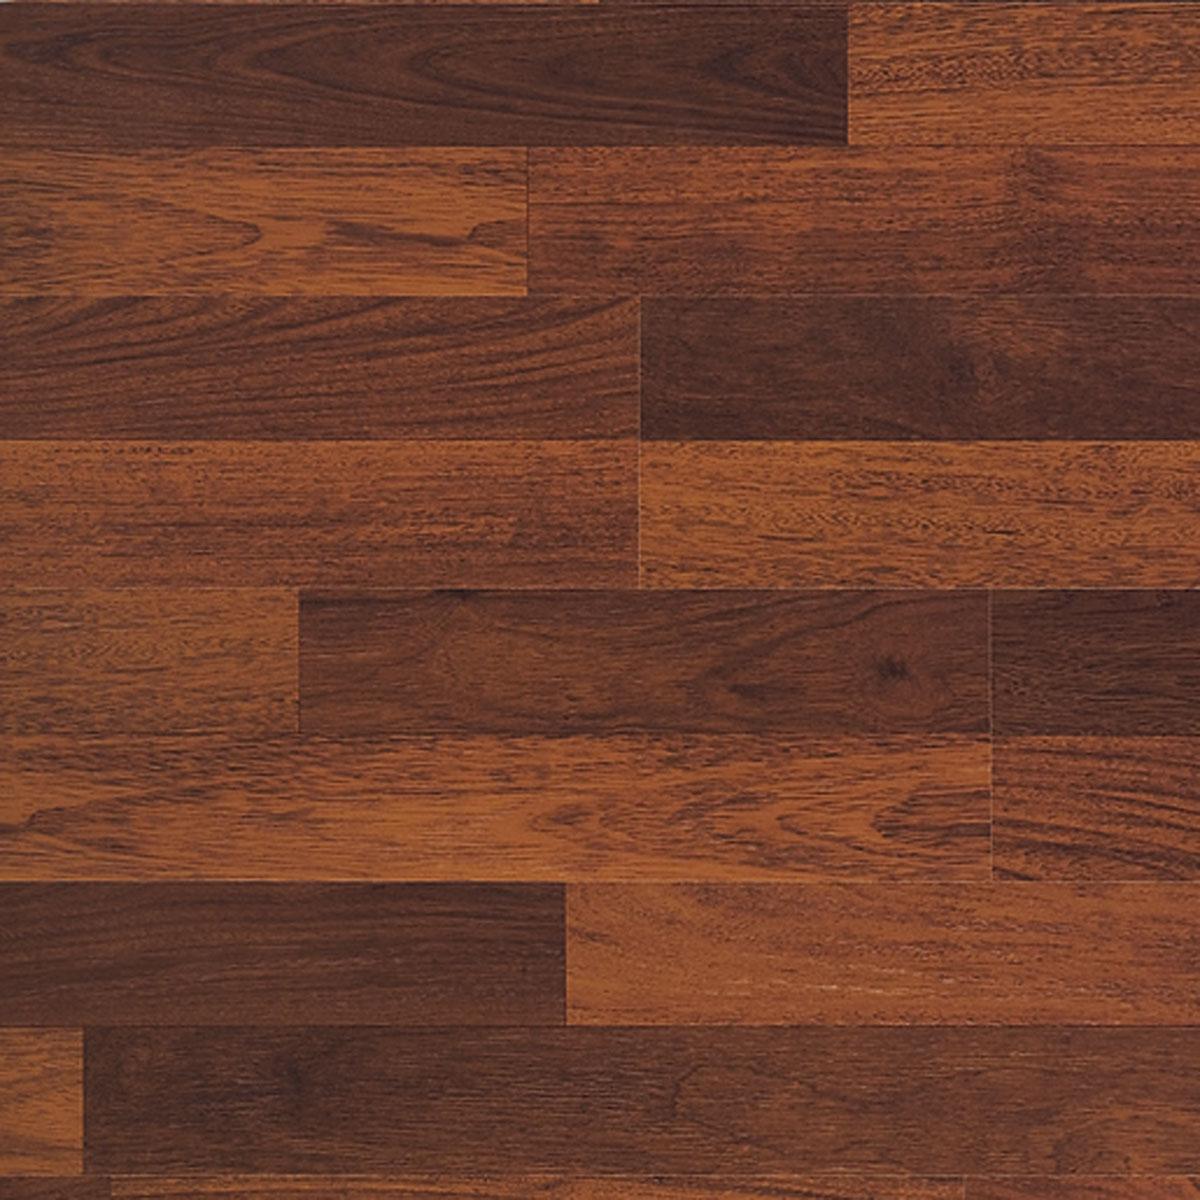 laminated wooden flooring photo - 2 MHTZVAO